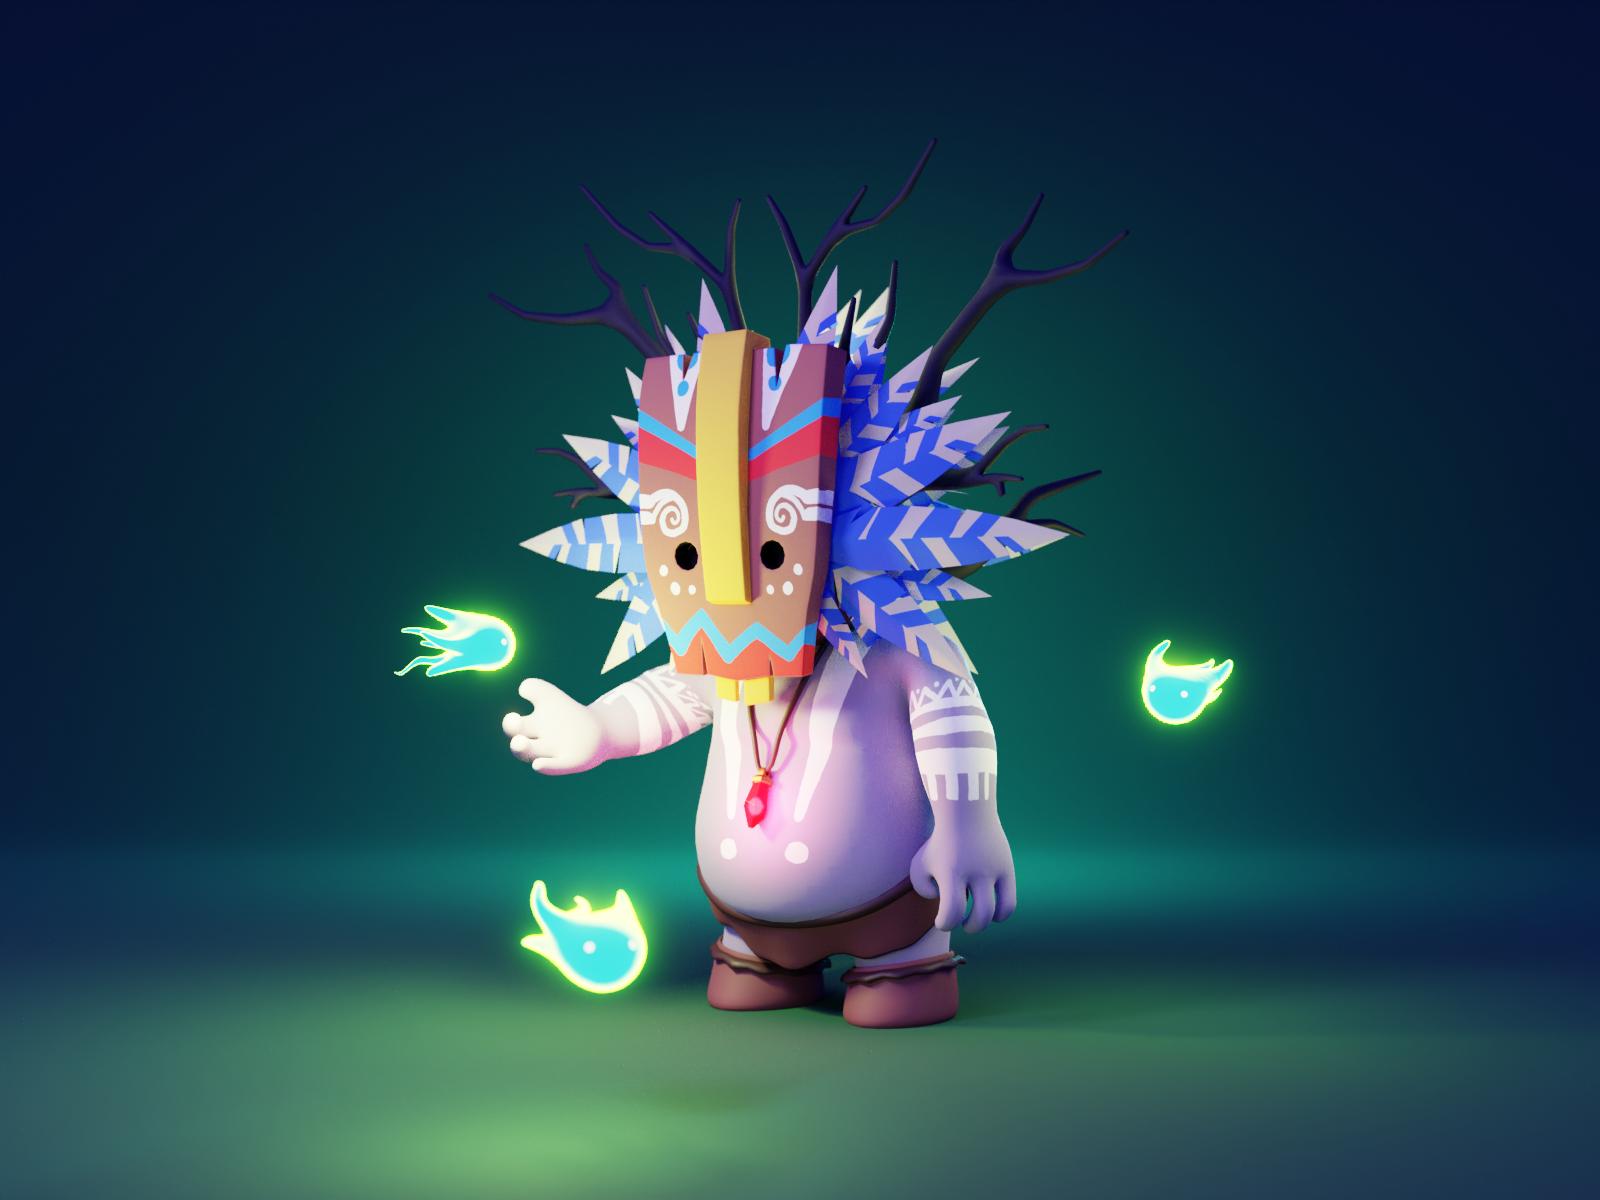 Tiki Shaman character illustration 3d character charater design character render blender illustration 3d